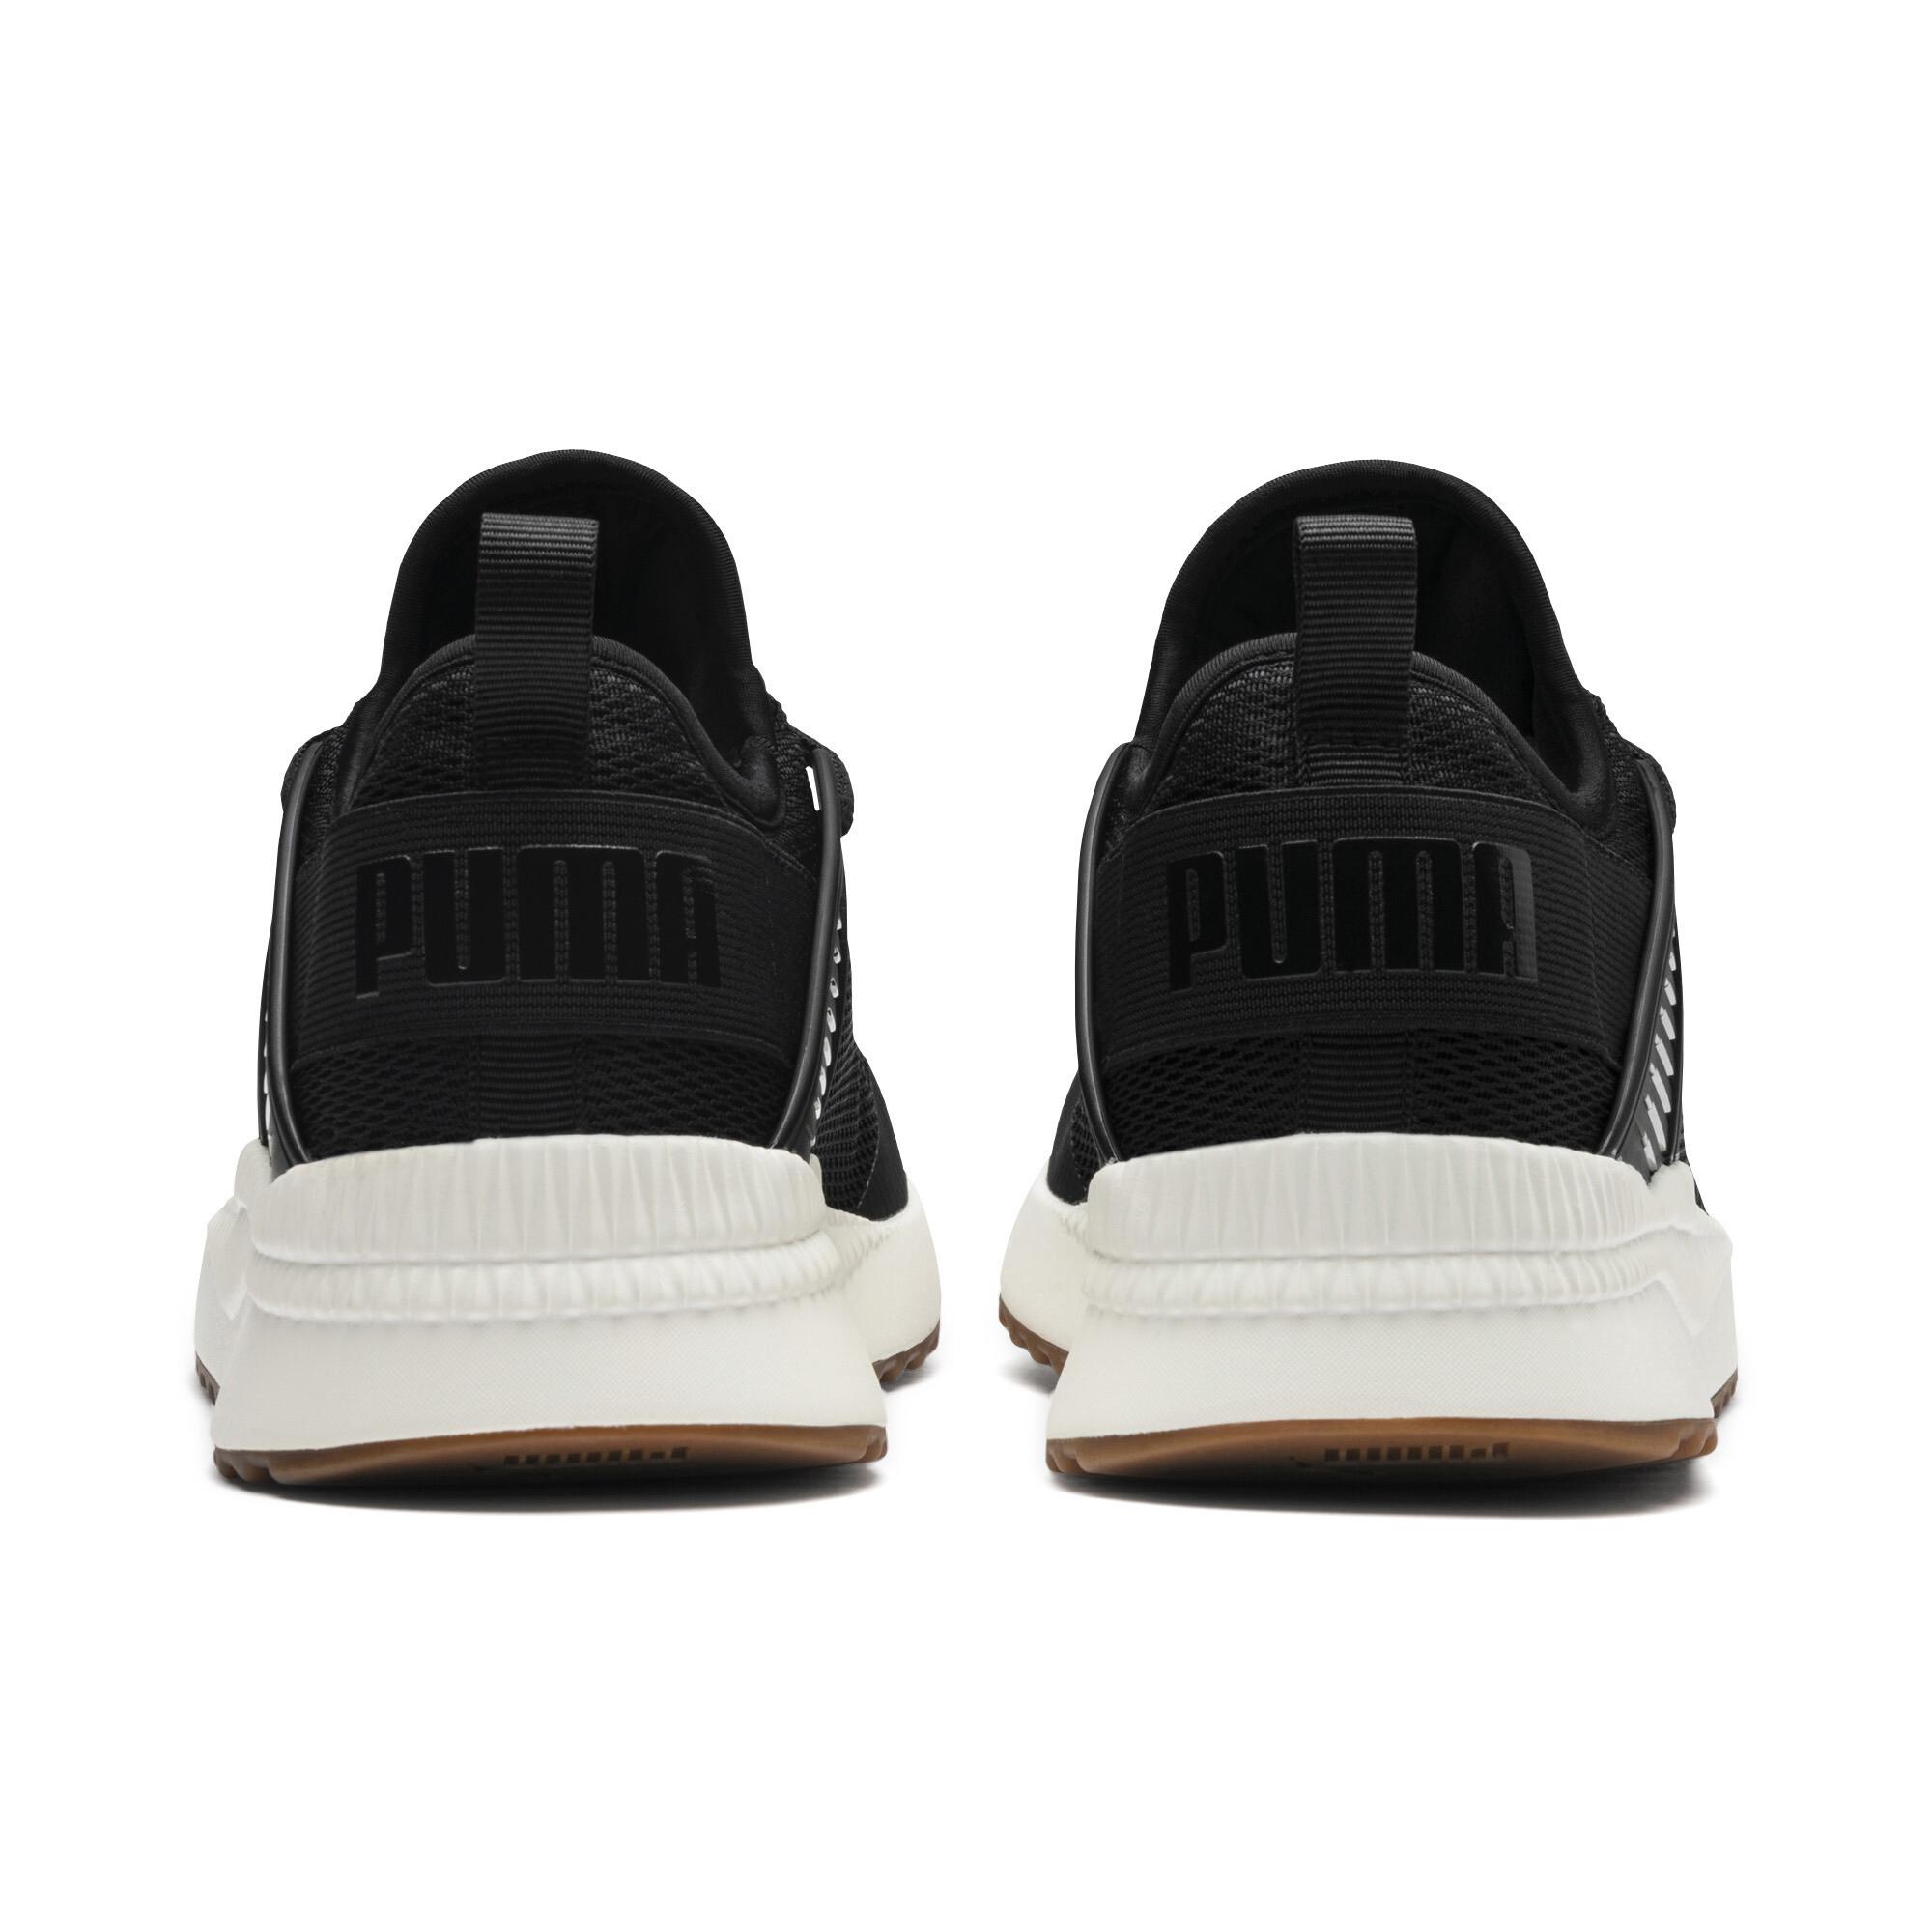 PUMA-Pacer-Next-Cage-Sneakers-Men-Shoe-Basics thumbnail 8